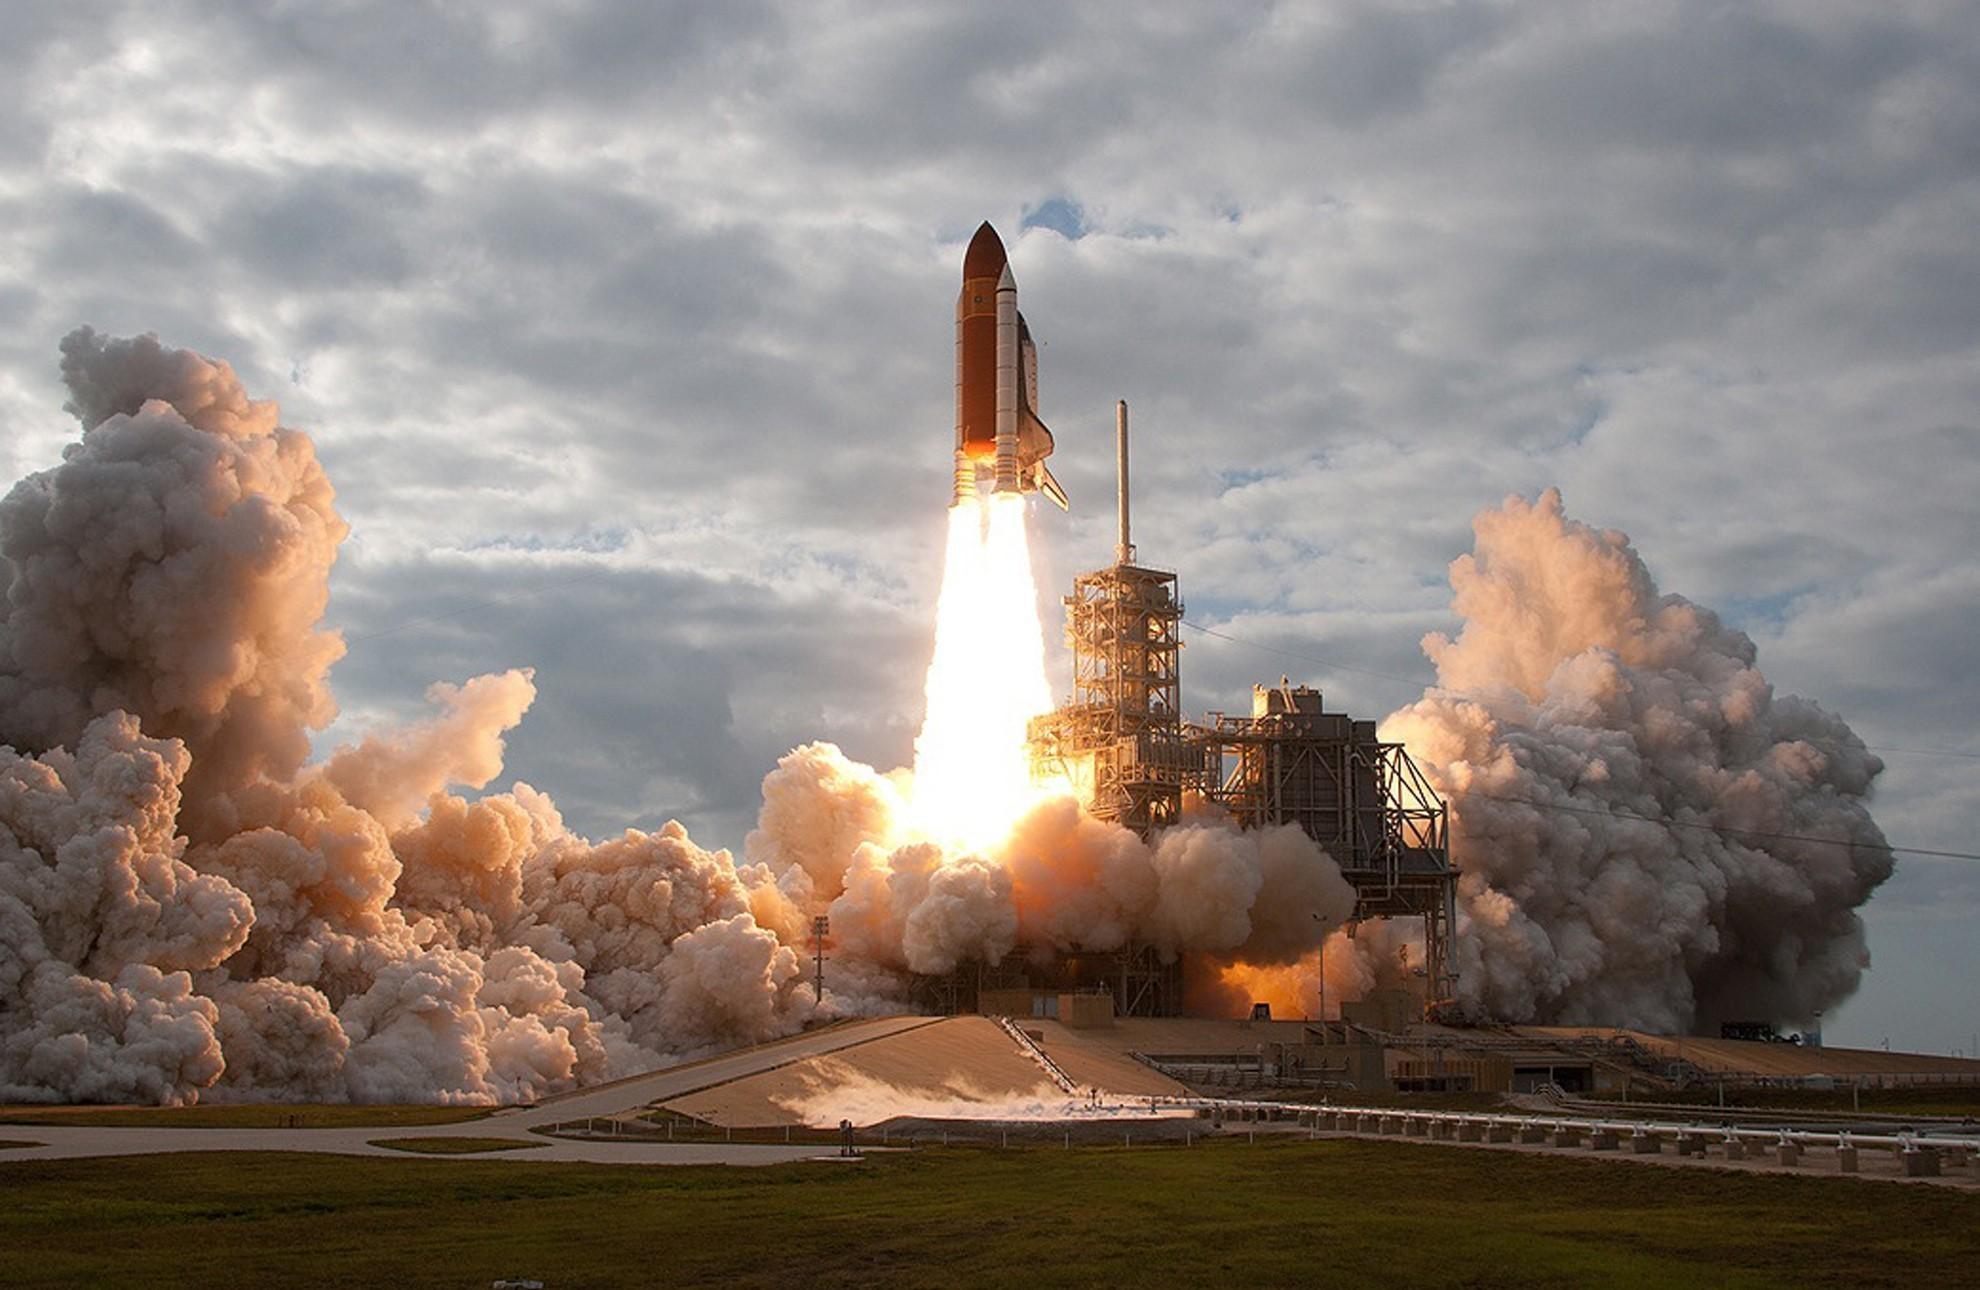 nasa shuttle development triumph and tragedy - HD1680×1050